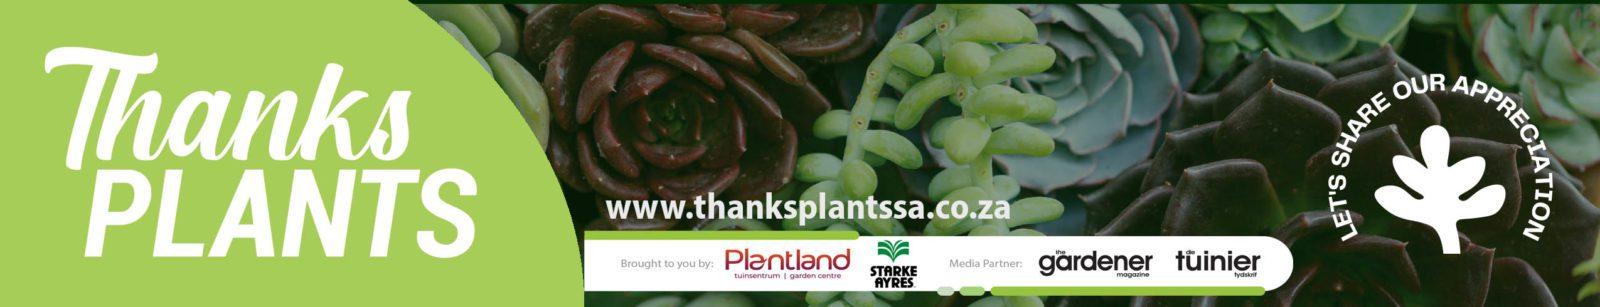 Thanks Plants Banner